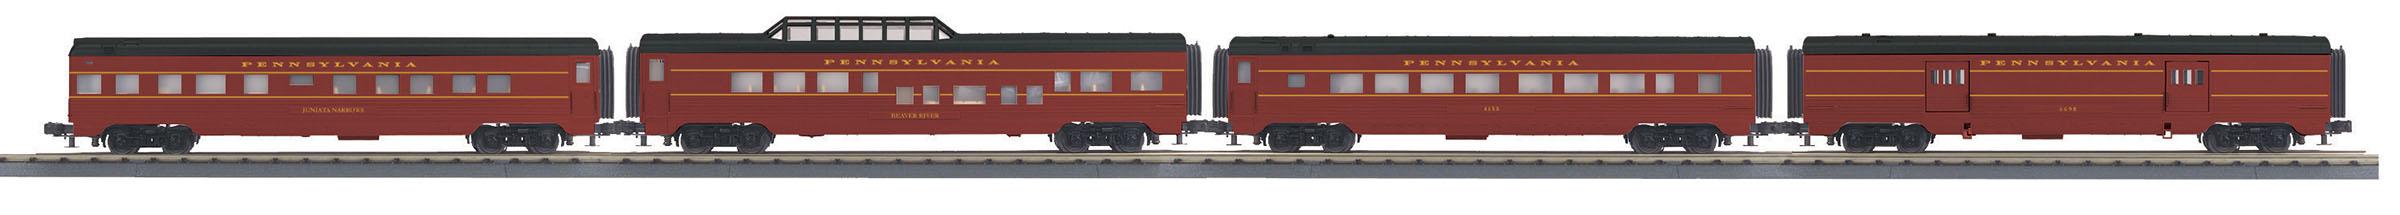 MTH 30-68148 4 Car 60' Streamlined Passenger Set 3 Rail RailKing Pennsylvania Railroad